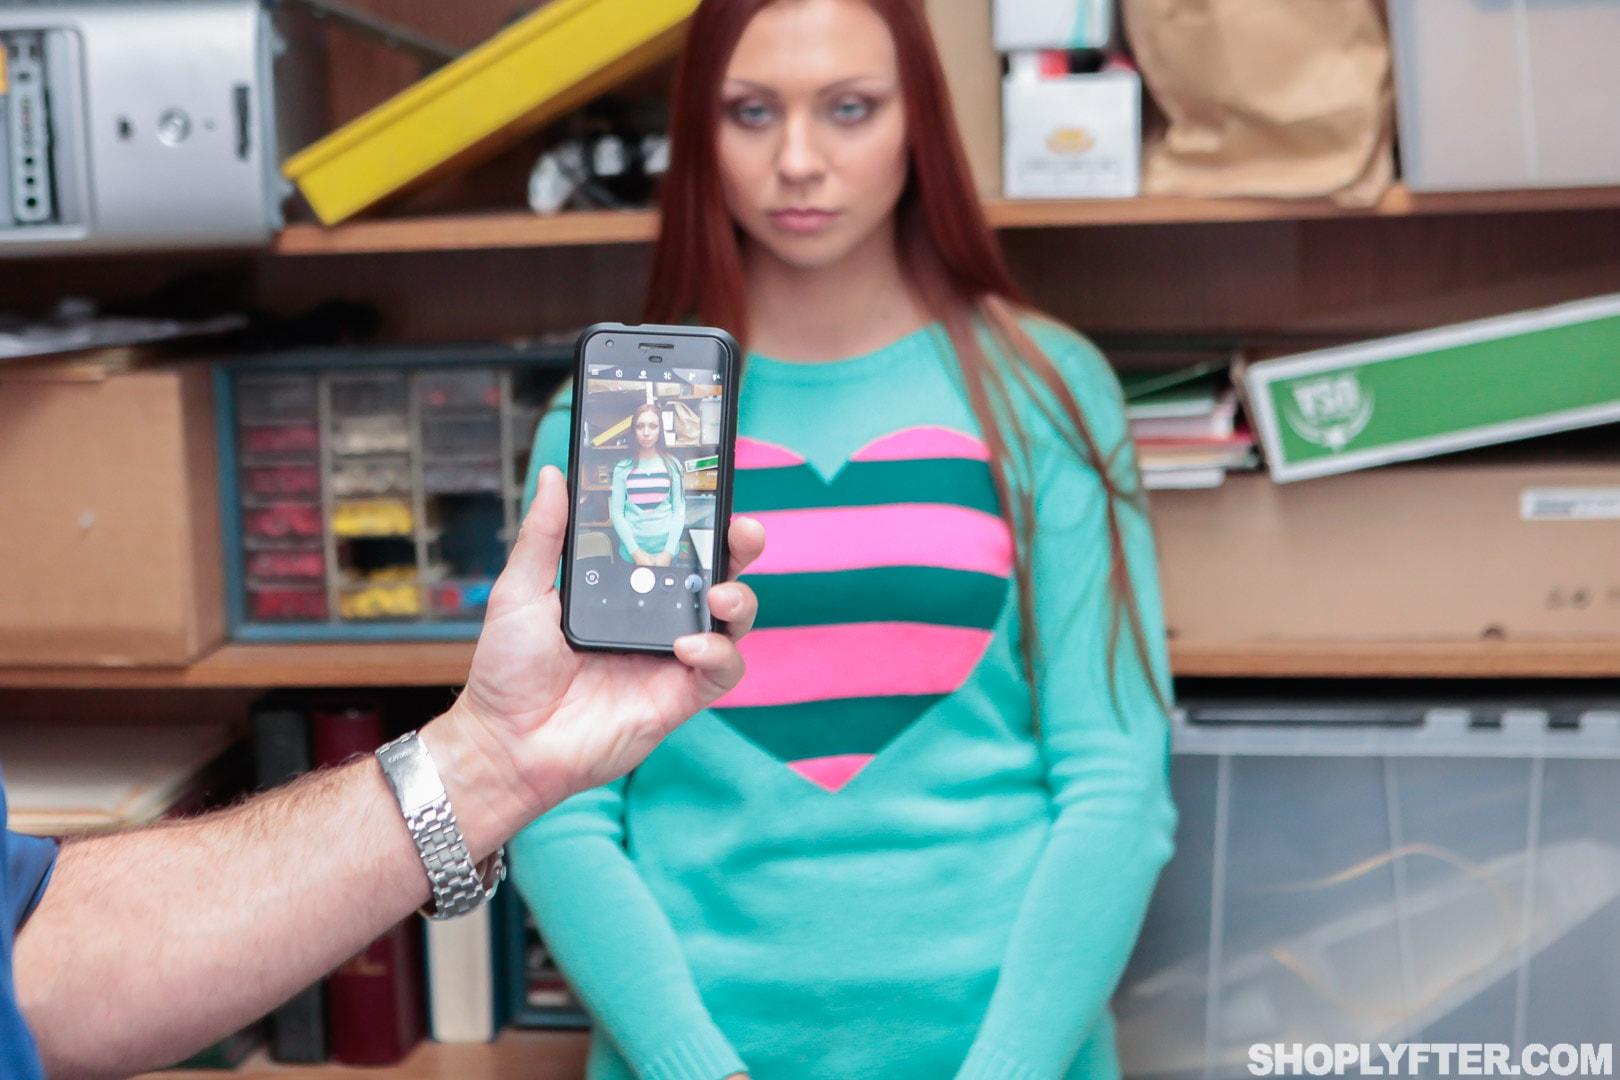 Team Skeet 'Case No. 3635587' starring Ornella Morgan (Photo 12)